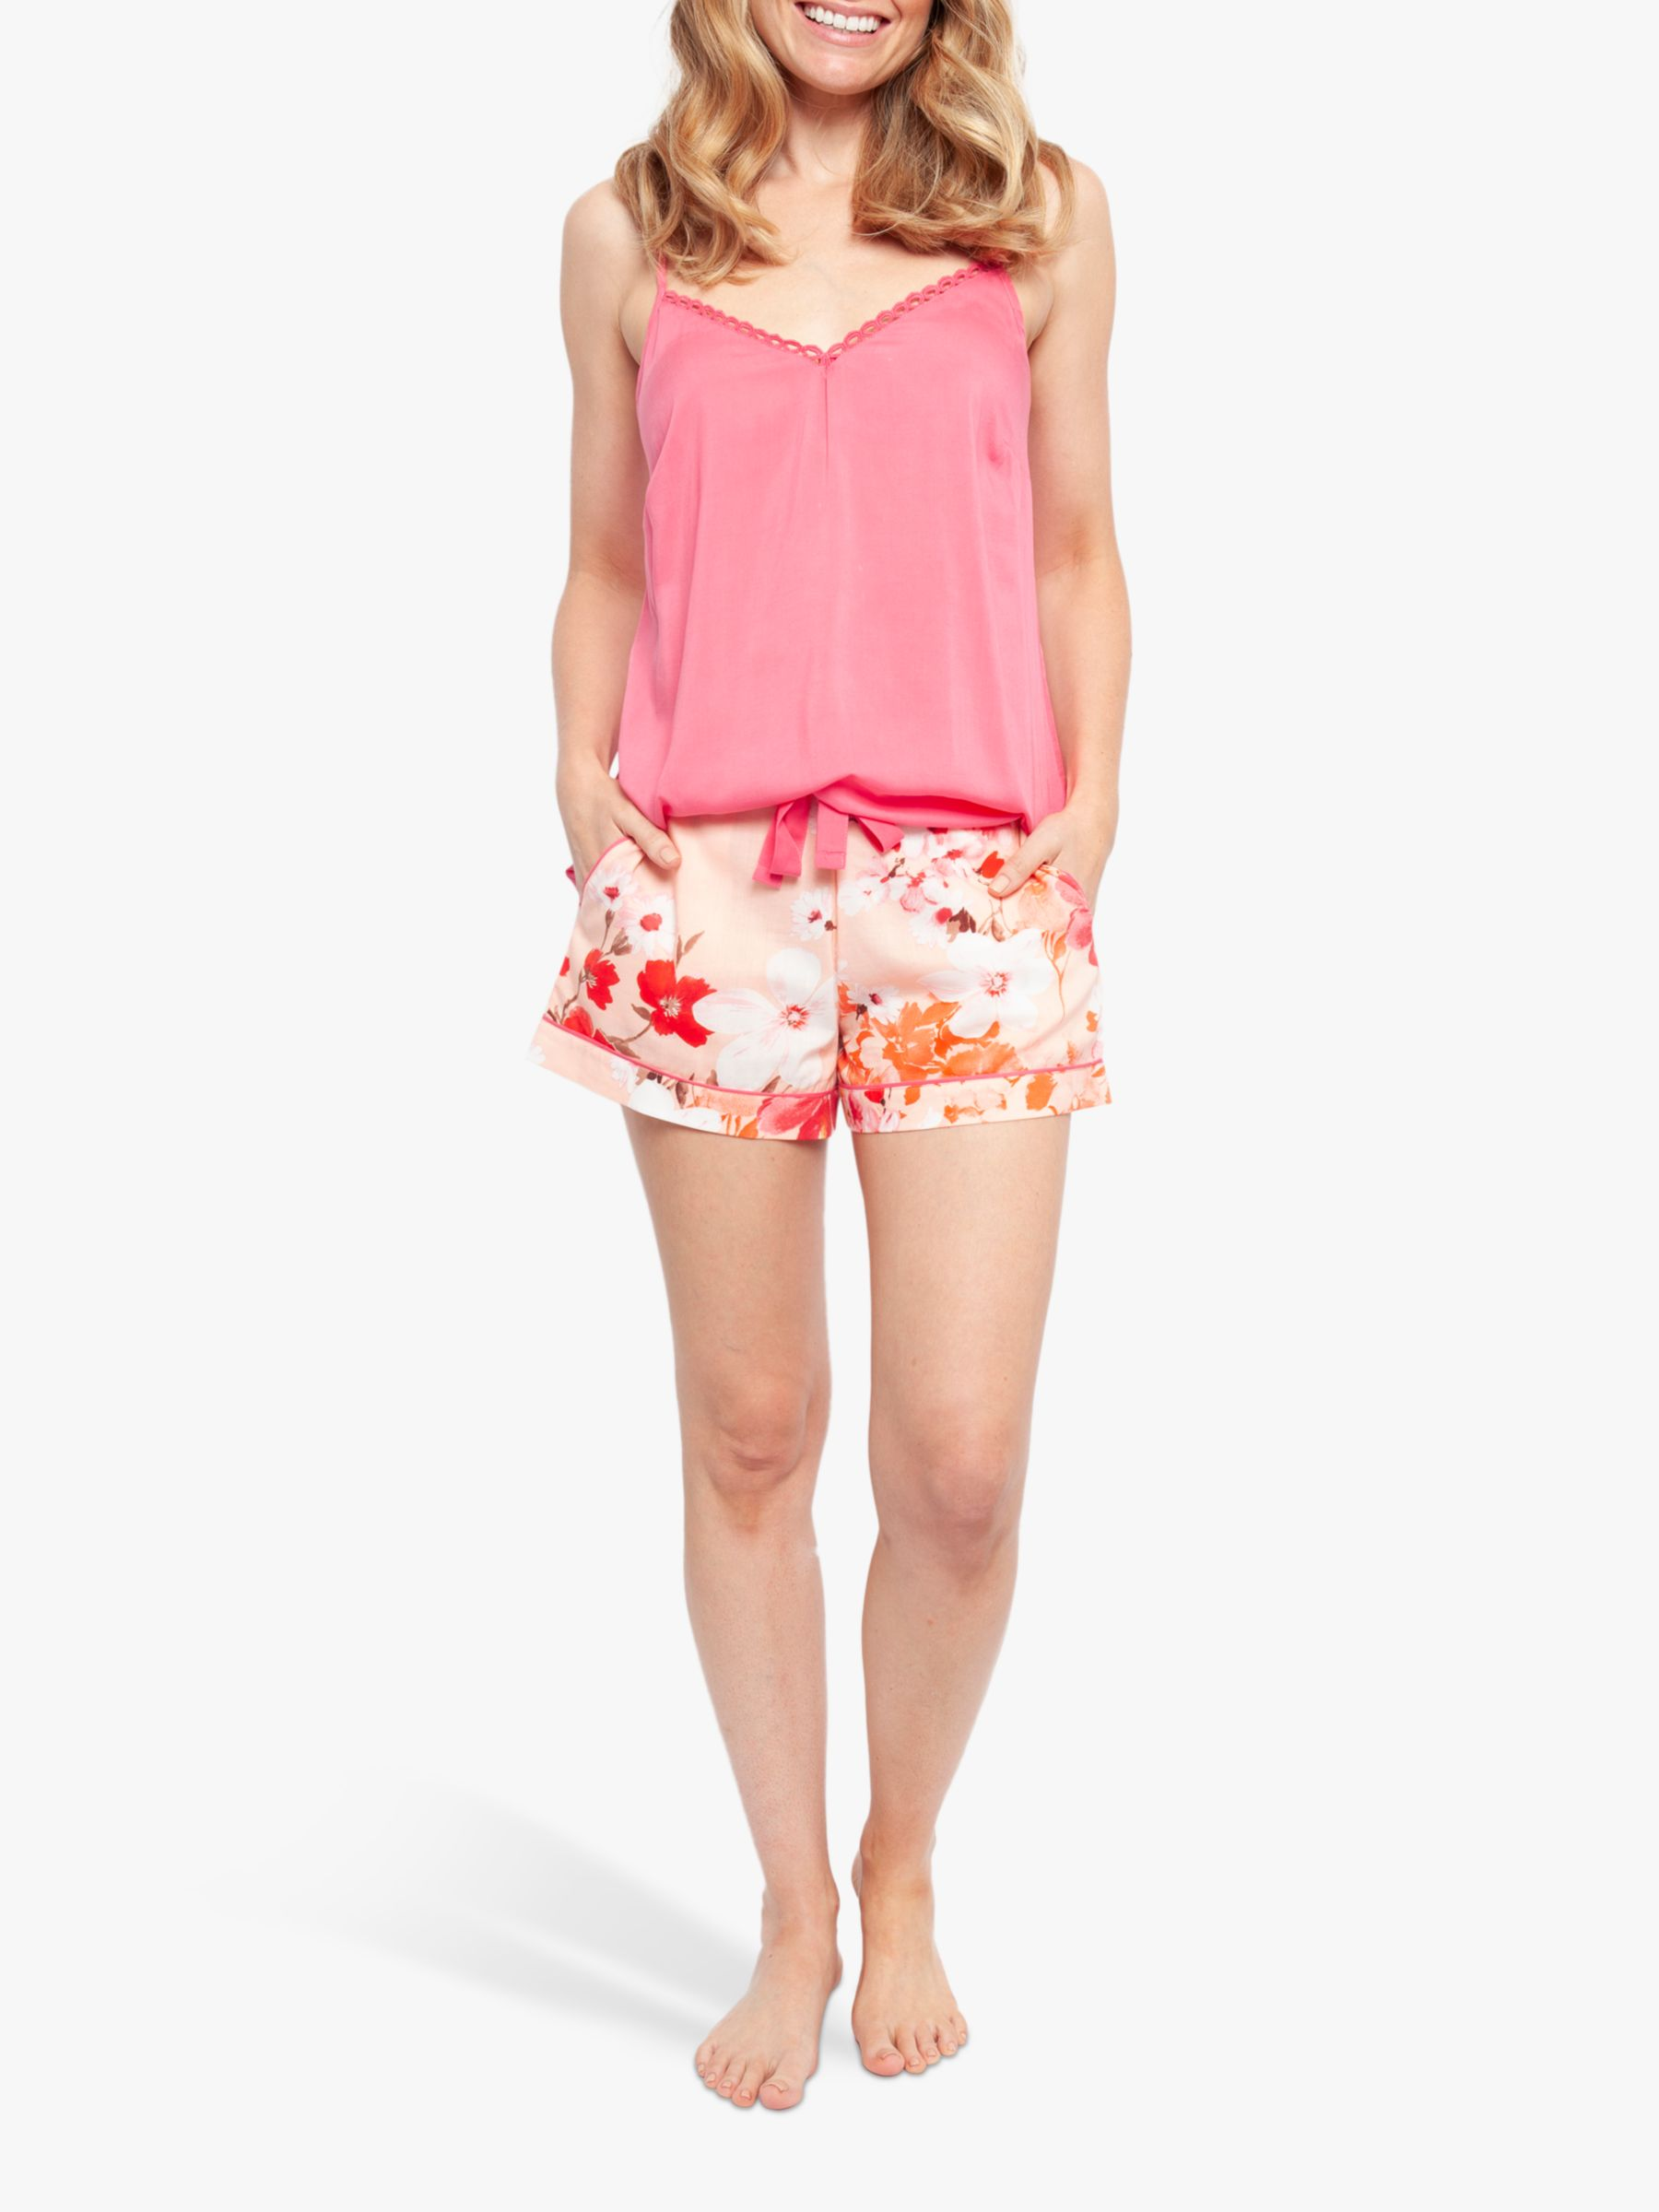 Cyberjammies Cyberjammies Darcie Botanical Print Camisole And Shorts Pyjama Set, Pink/Coral